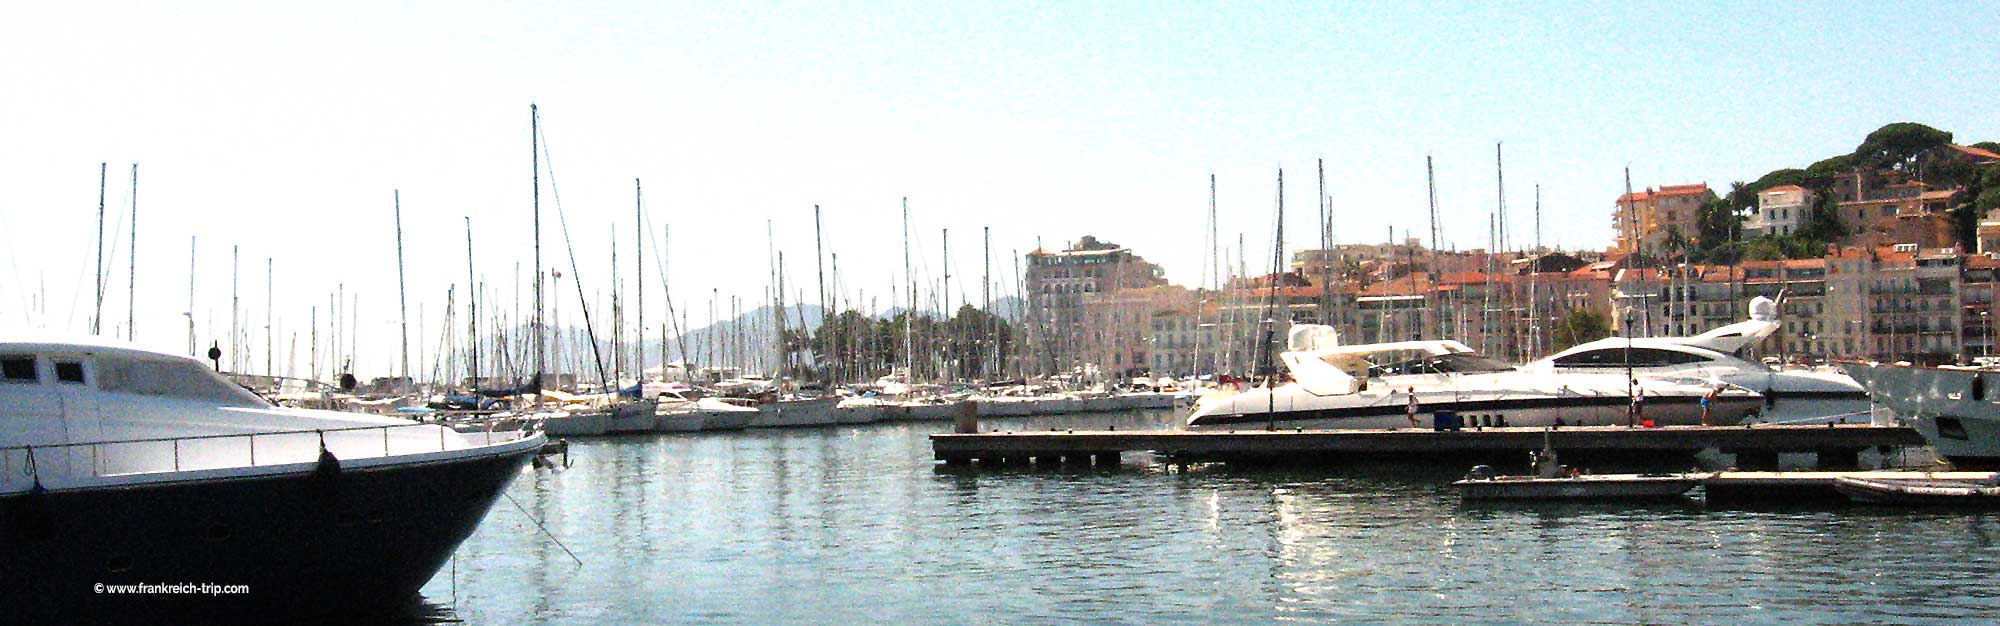 Südfrankreich Urlaub Côte d'Azur